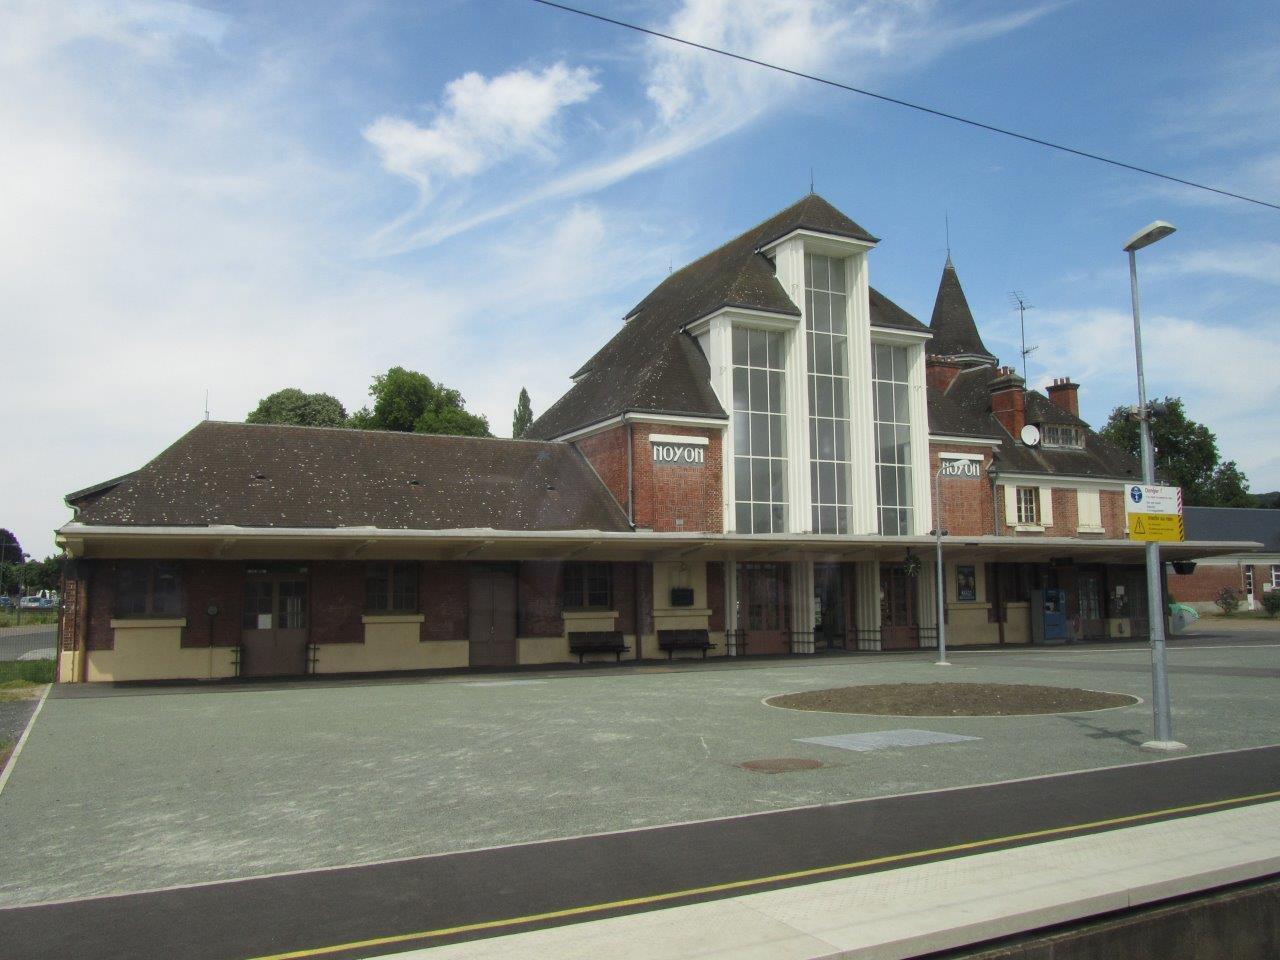 gare-de-noyon-train-station